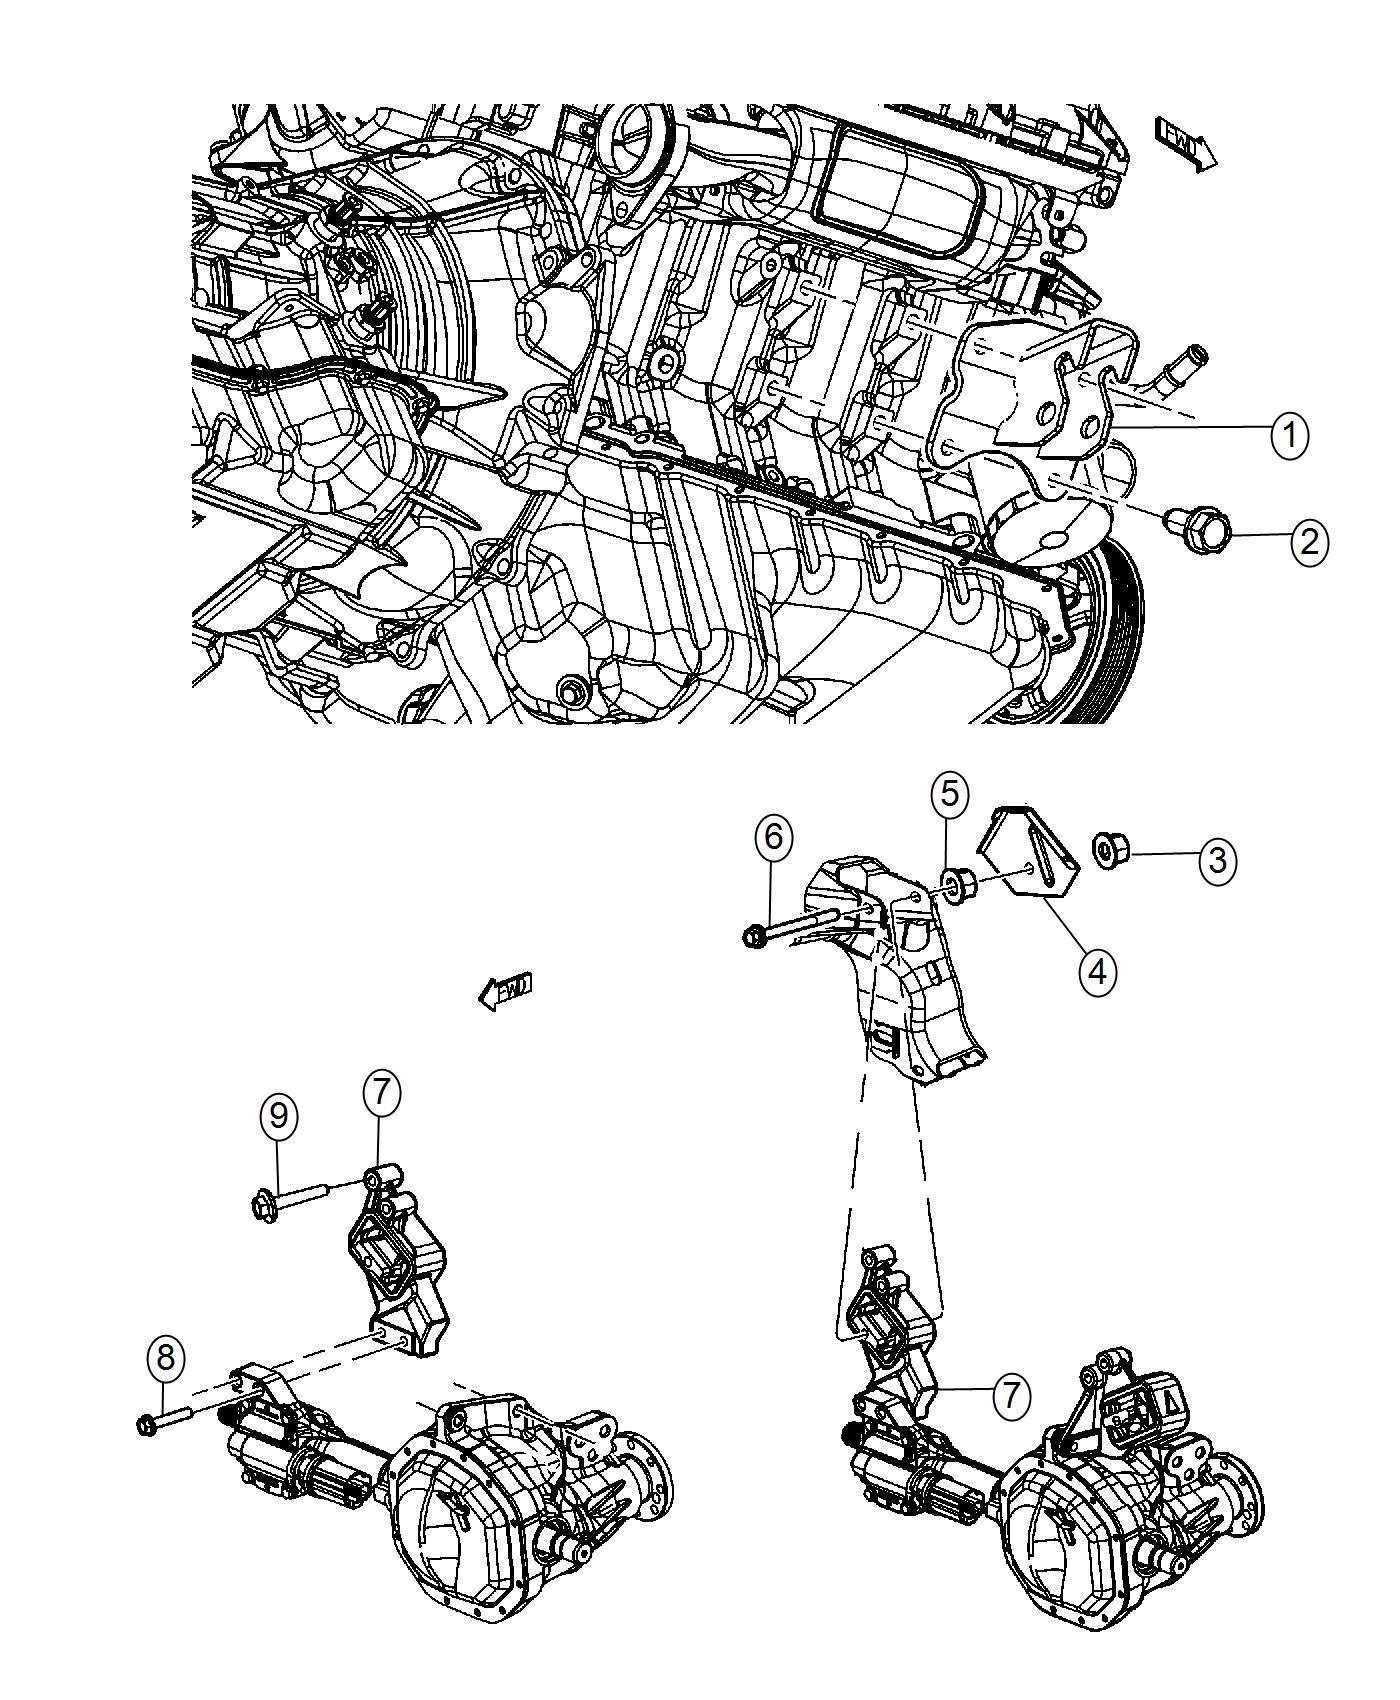 Ram Insulator Engine Mount Right Side Load